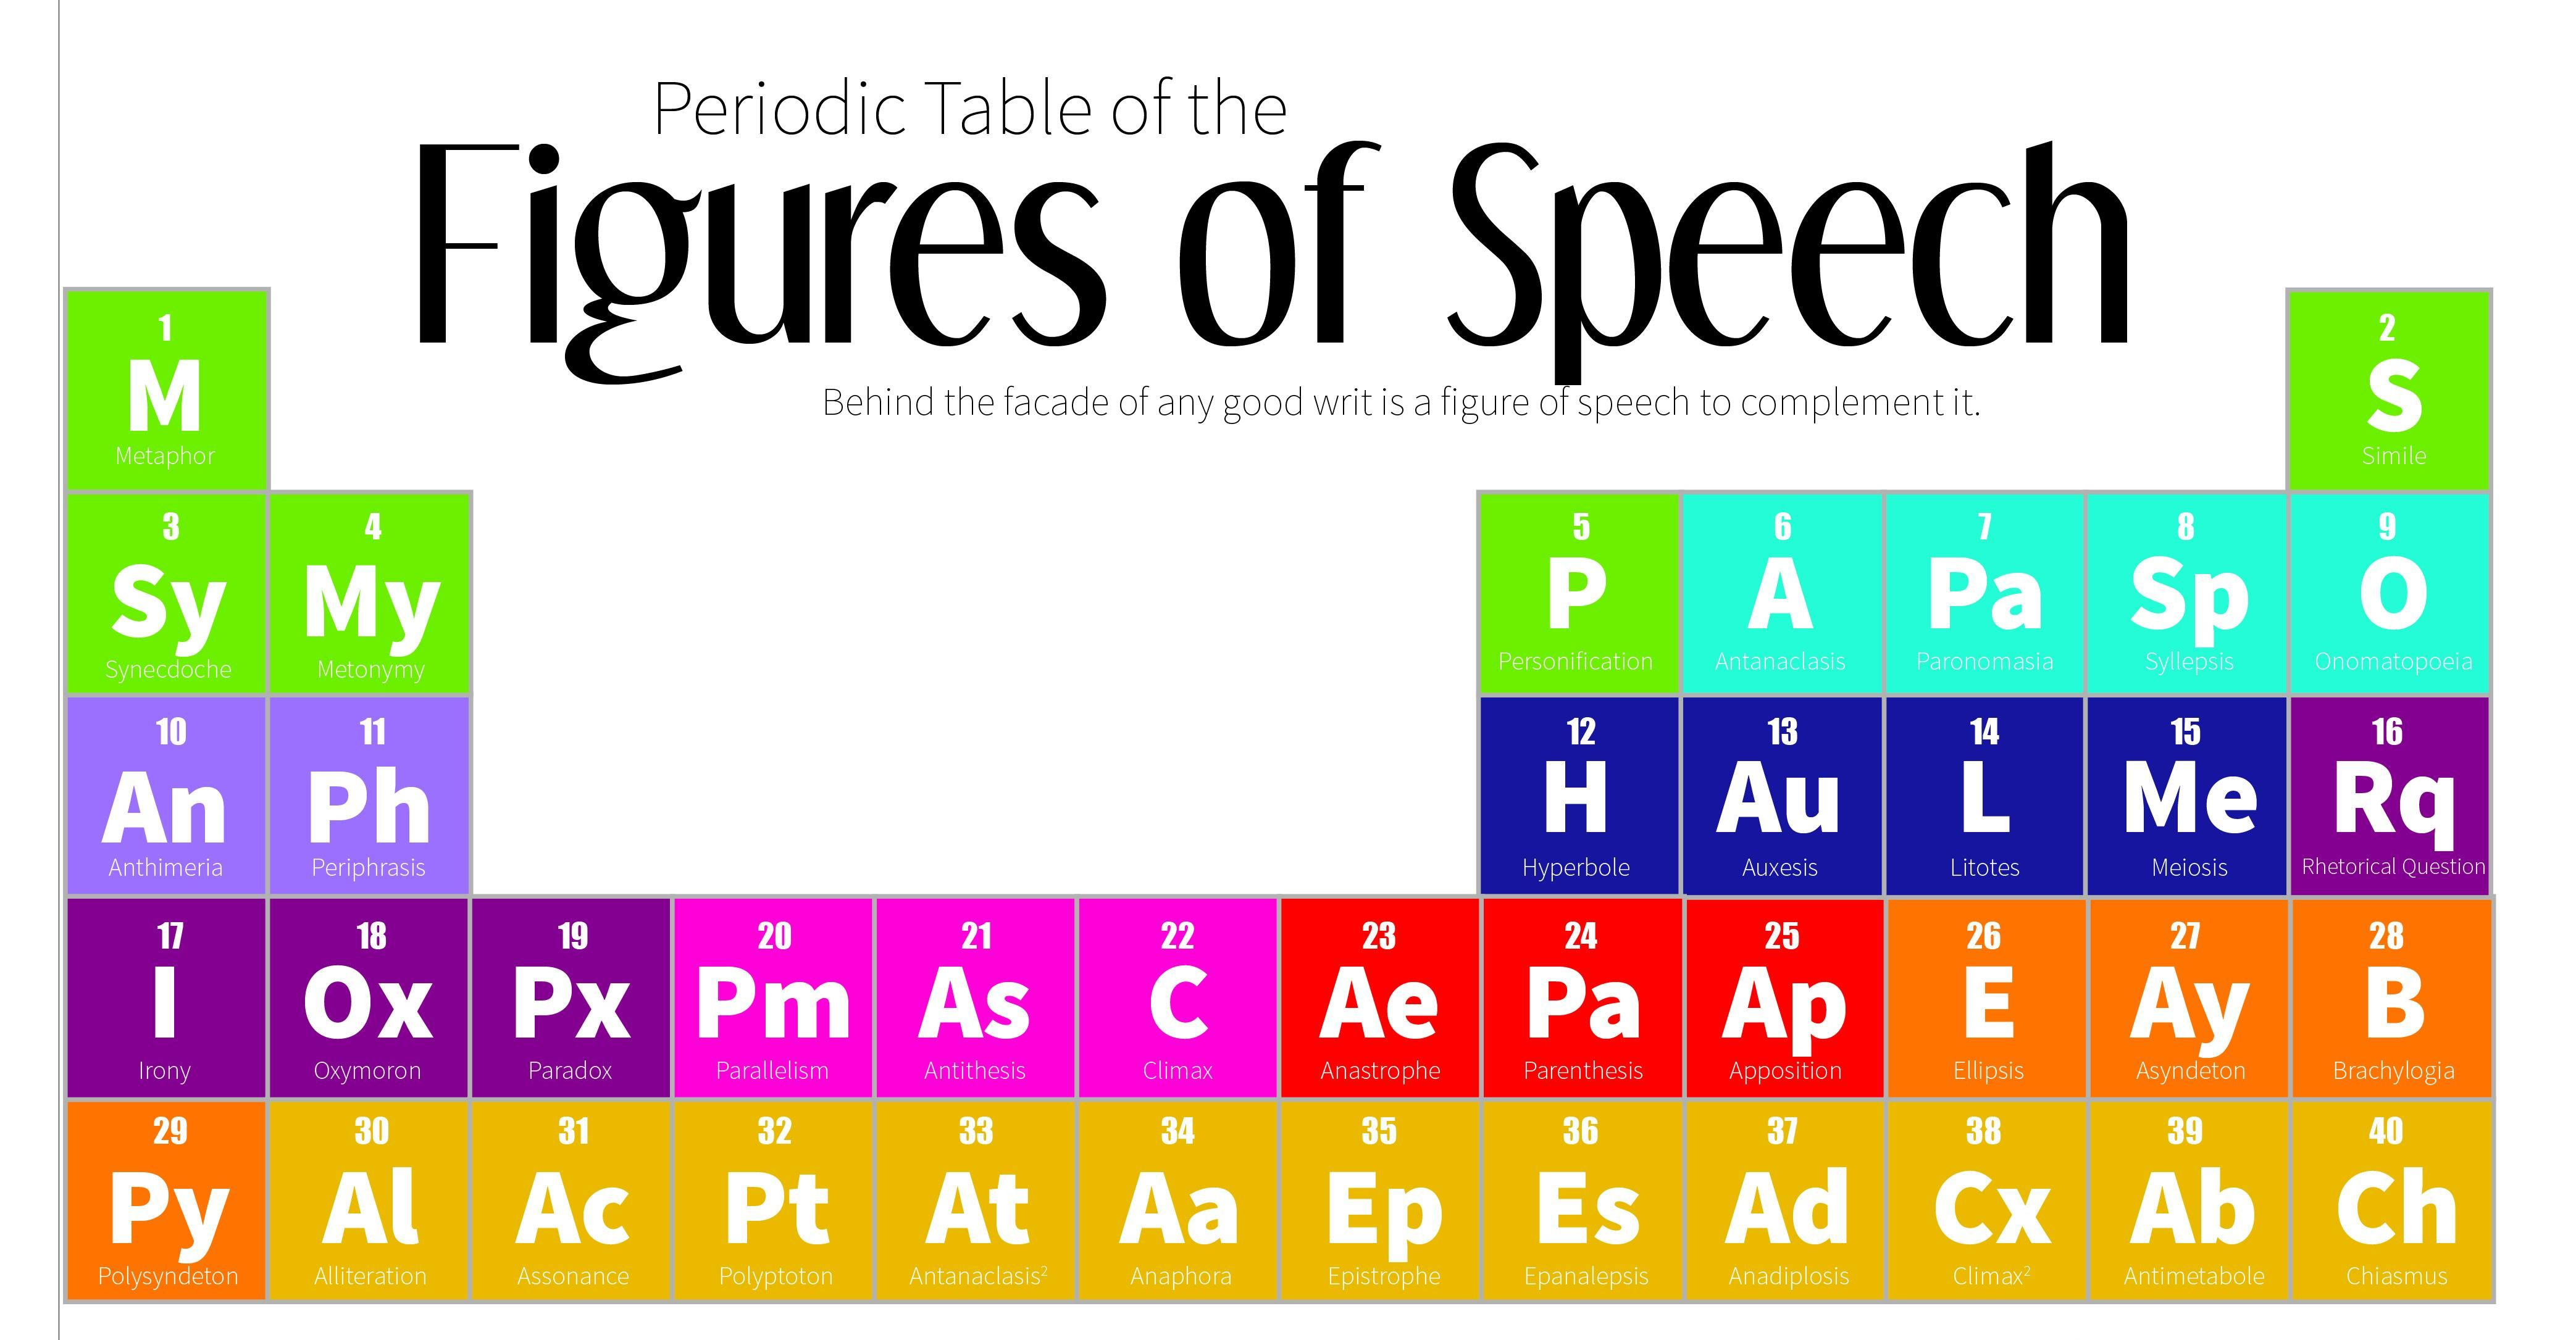 Edmodo spotlight periodic table of figures of speech edmodo edmodo spotlight periodic table of figures of speech gamestrikefo Gallery